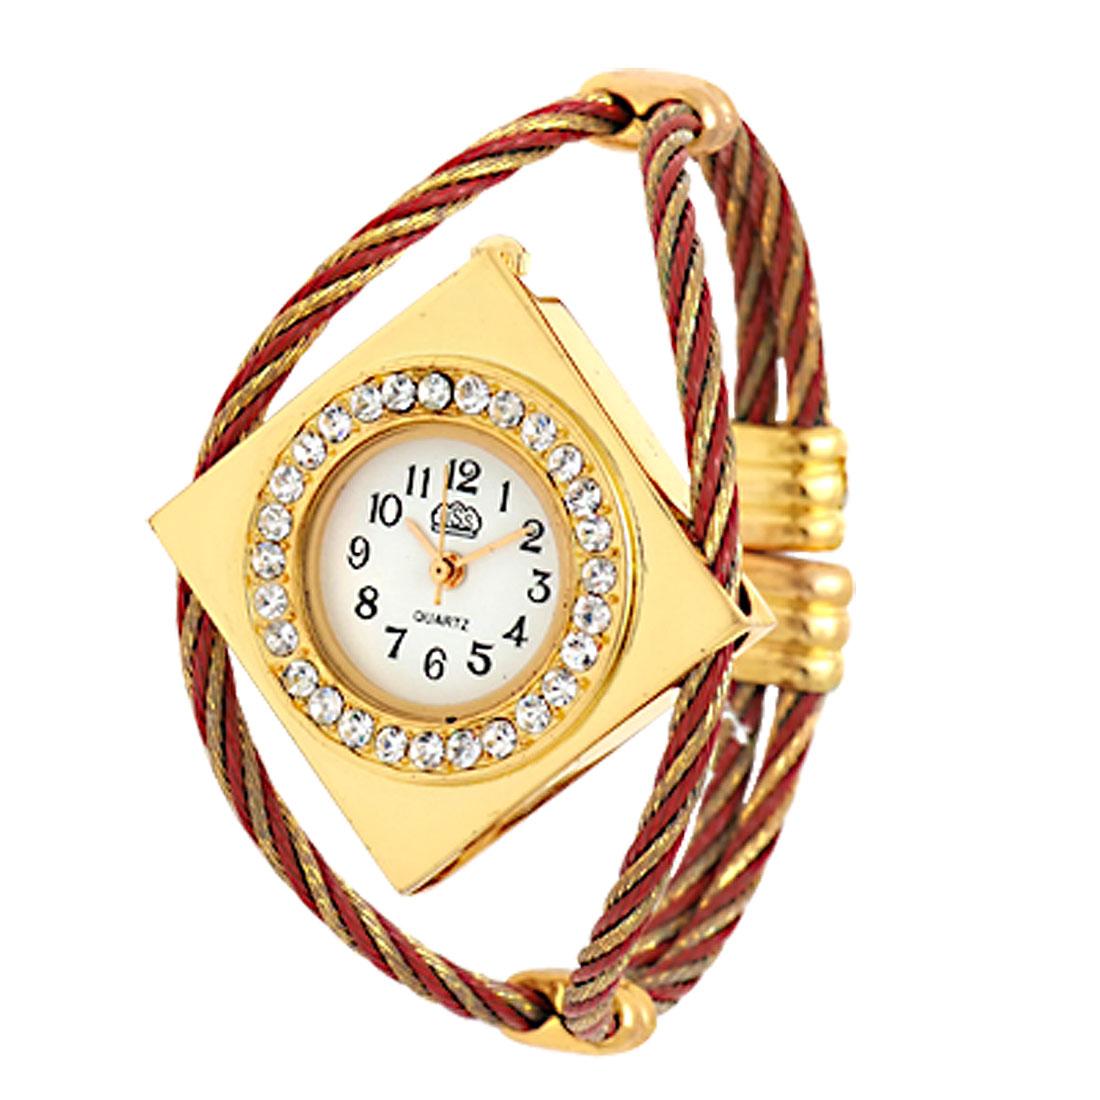 Golden Fashion Rhombic Watch Case Bracelet Girl's Quartz Watch